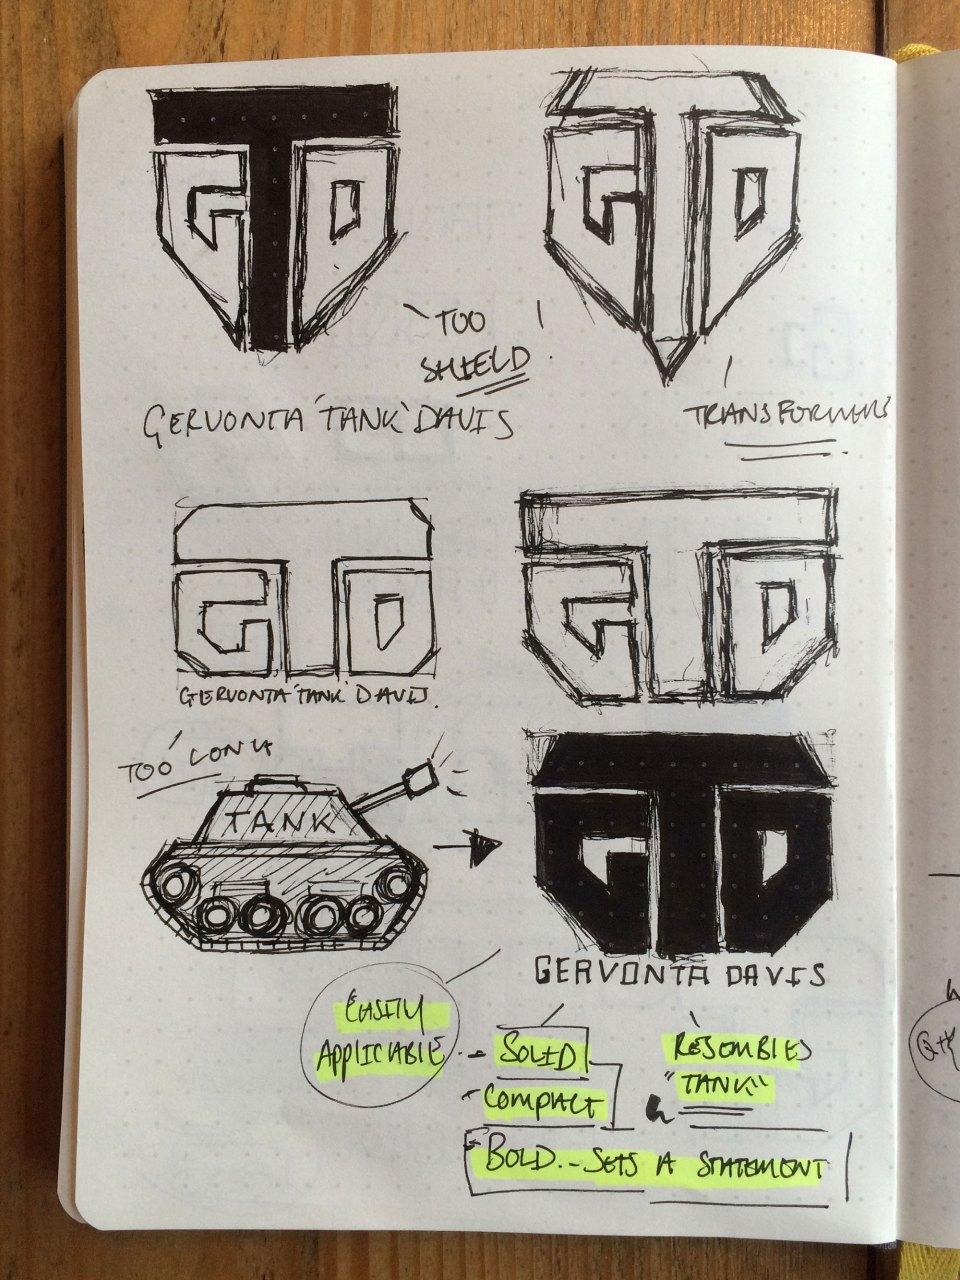 Development of Gervonta Davis logo design